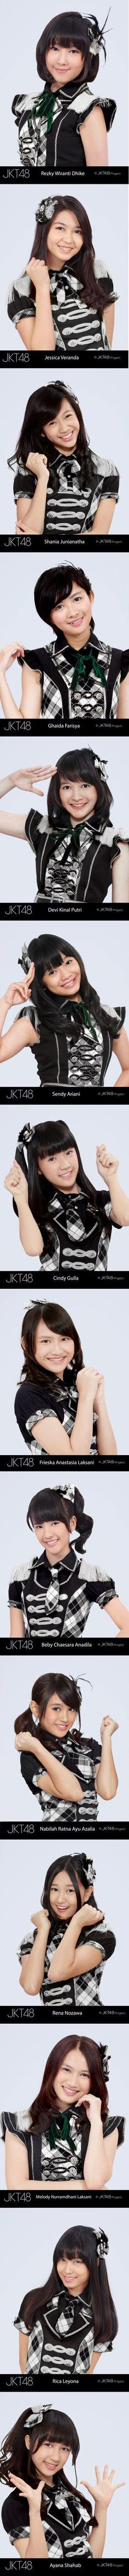 JKT48 Rona Anggreani Ayen Rona